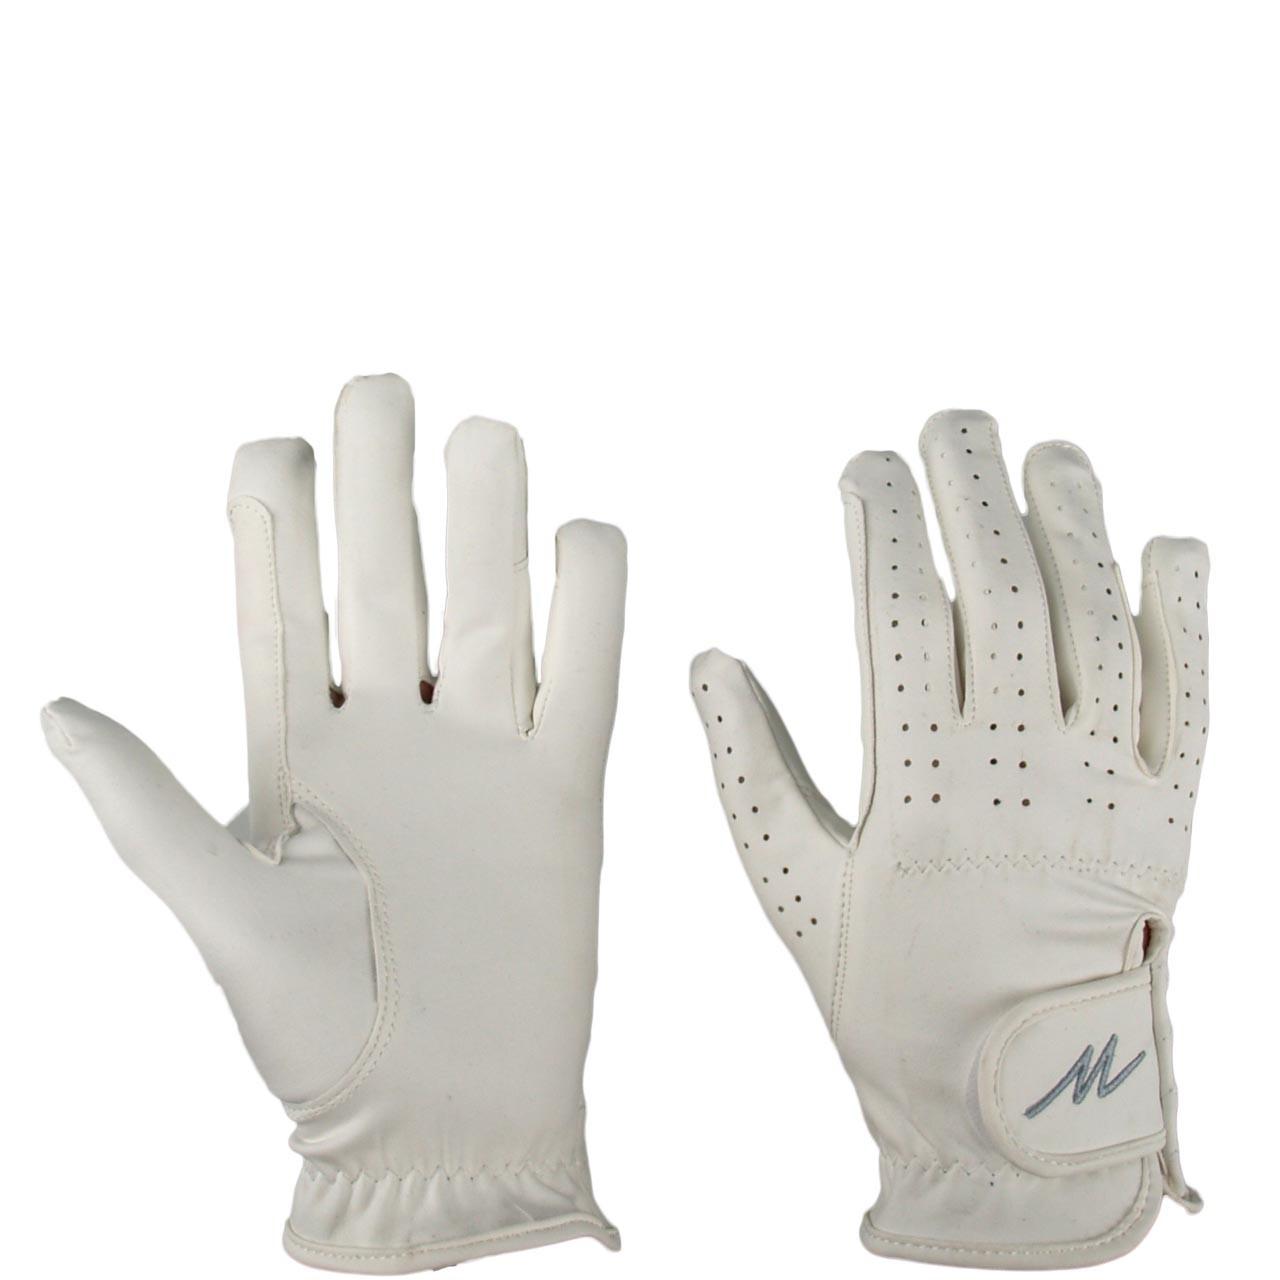 Mondoni Leatherfeel handschoen wit maat:7